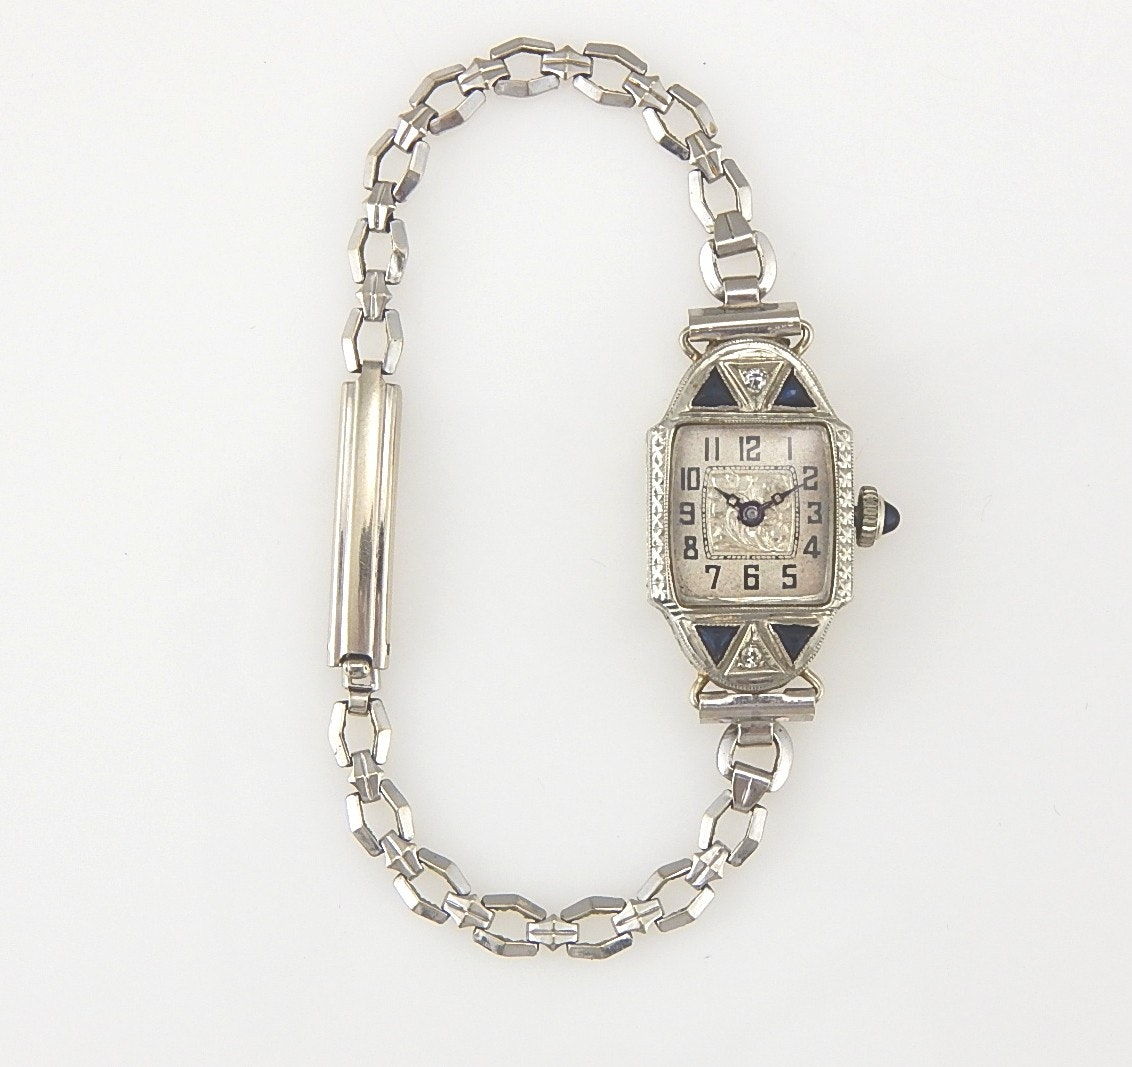 18K White Gold Art Deco Styled Wristwatch